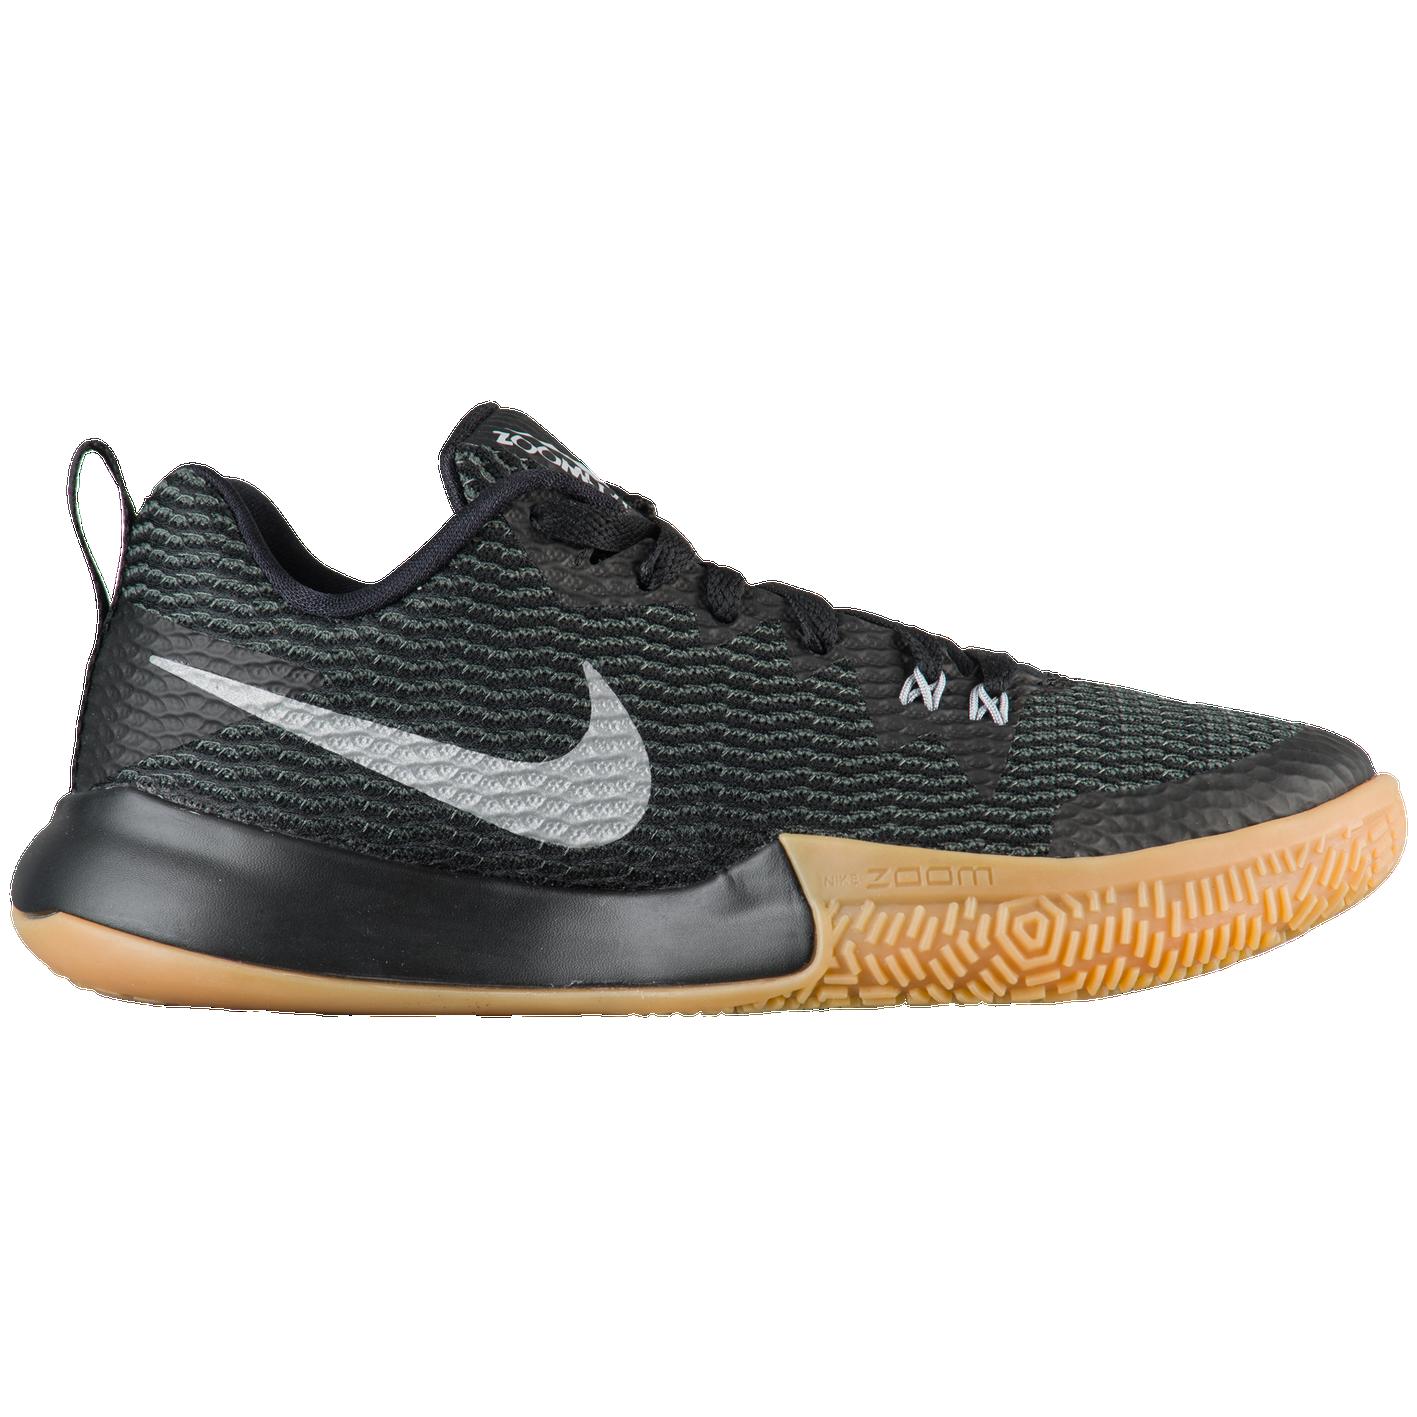 531257d6508a Nike Zoom Shift II - Women s - Basketball - Shoes - Black Reflective ...